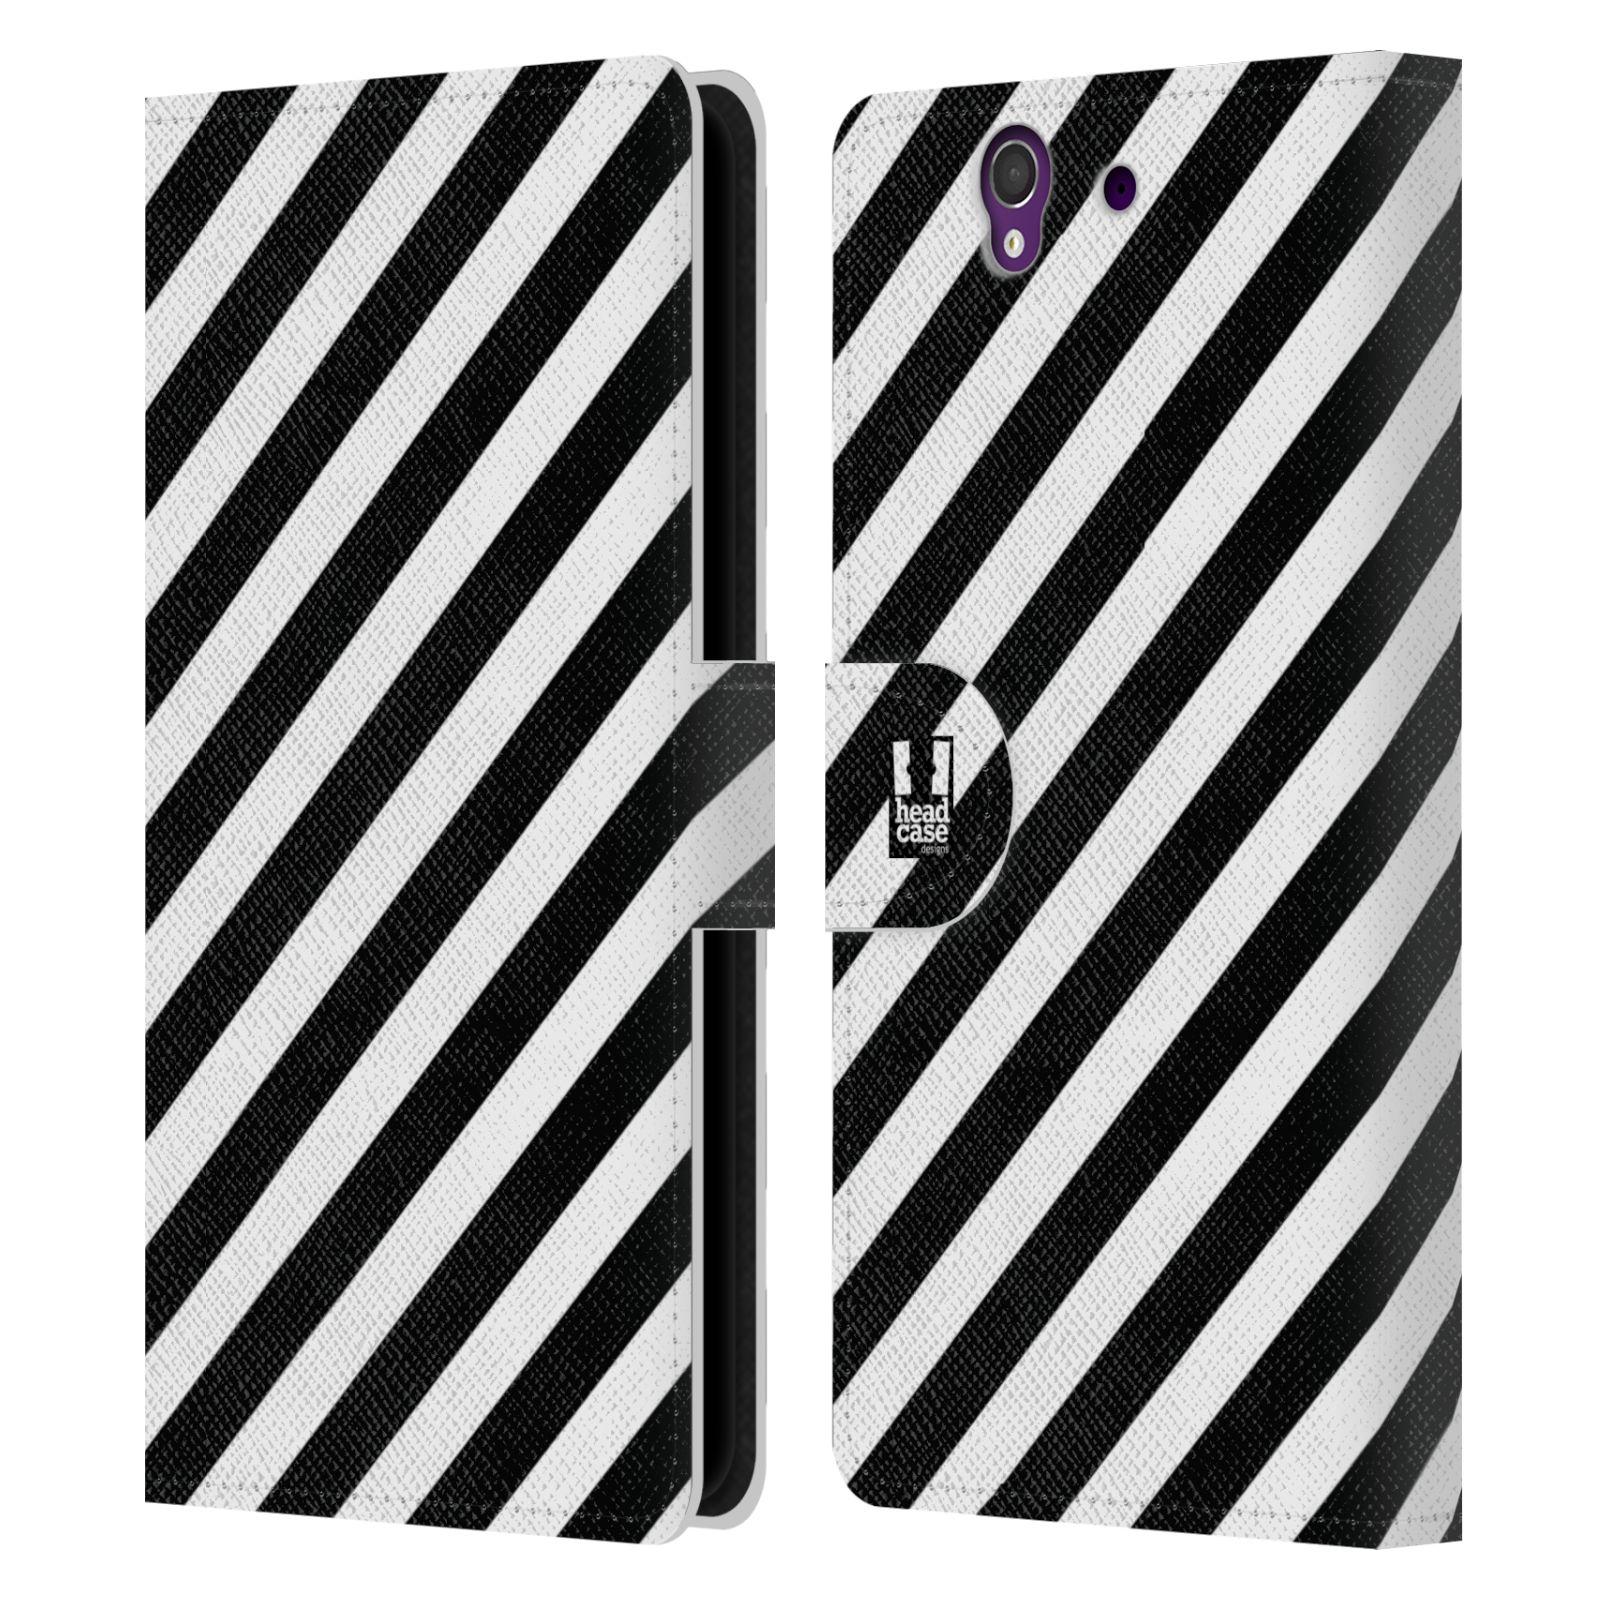 HEAD CASE Flipové pouzdro pro mobil SONY XPERIA Z (C6603) ČERNÁ A BÍLÁ zebra pruhy